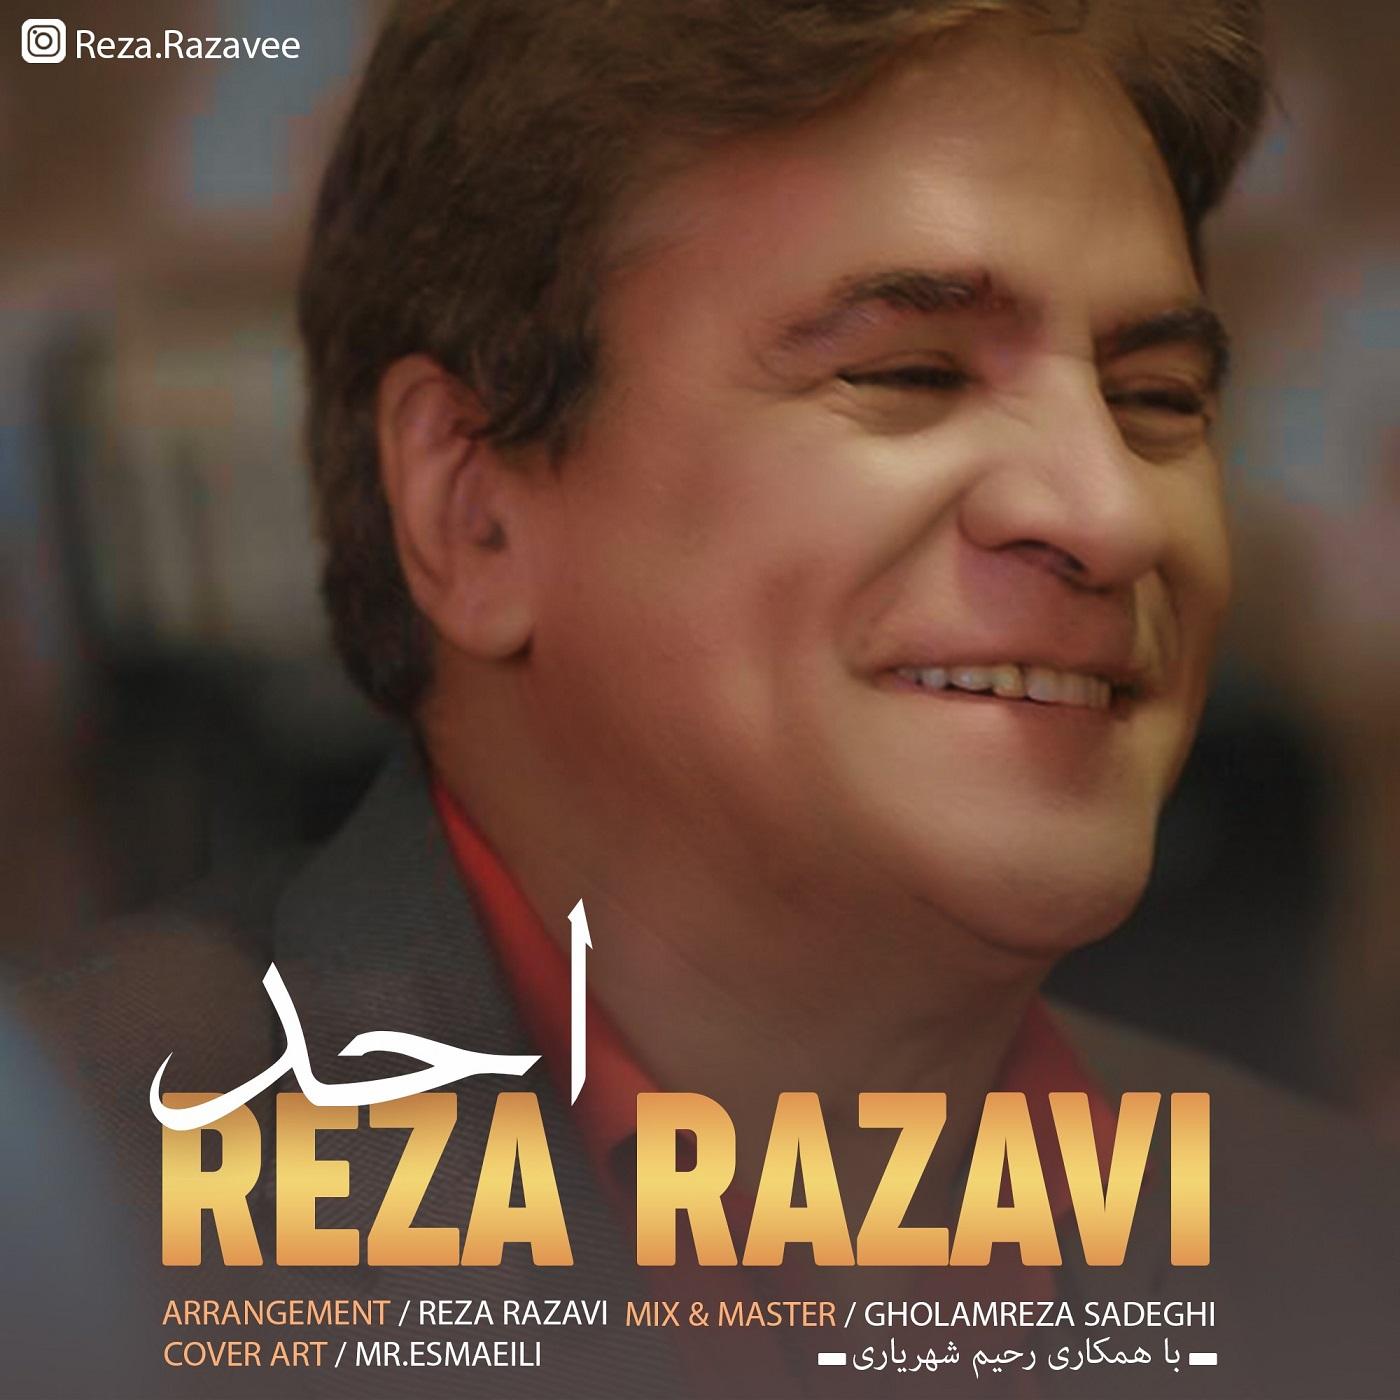 https://s16.picofile.com/file/8427565992/14Reza_Razavi_Ahad.jpg